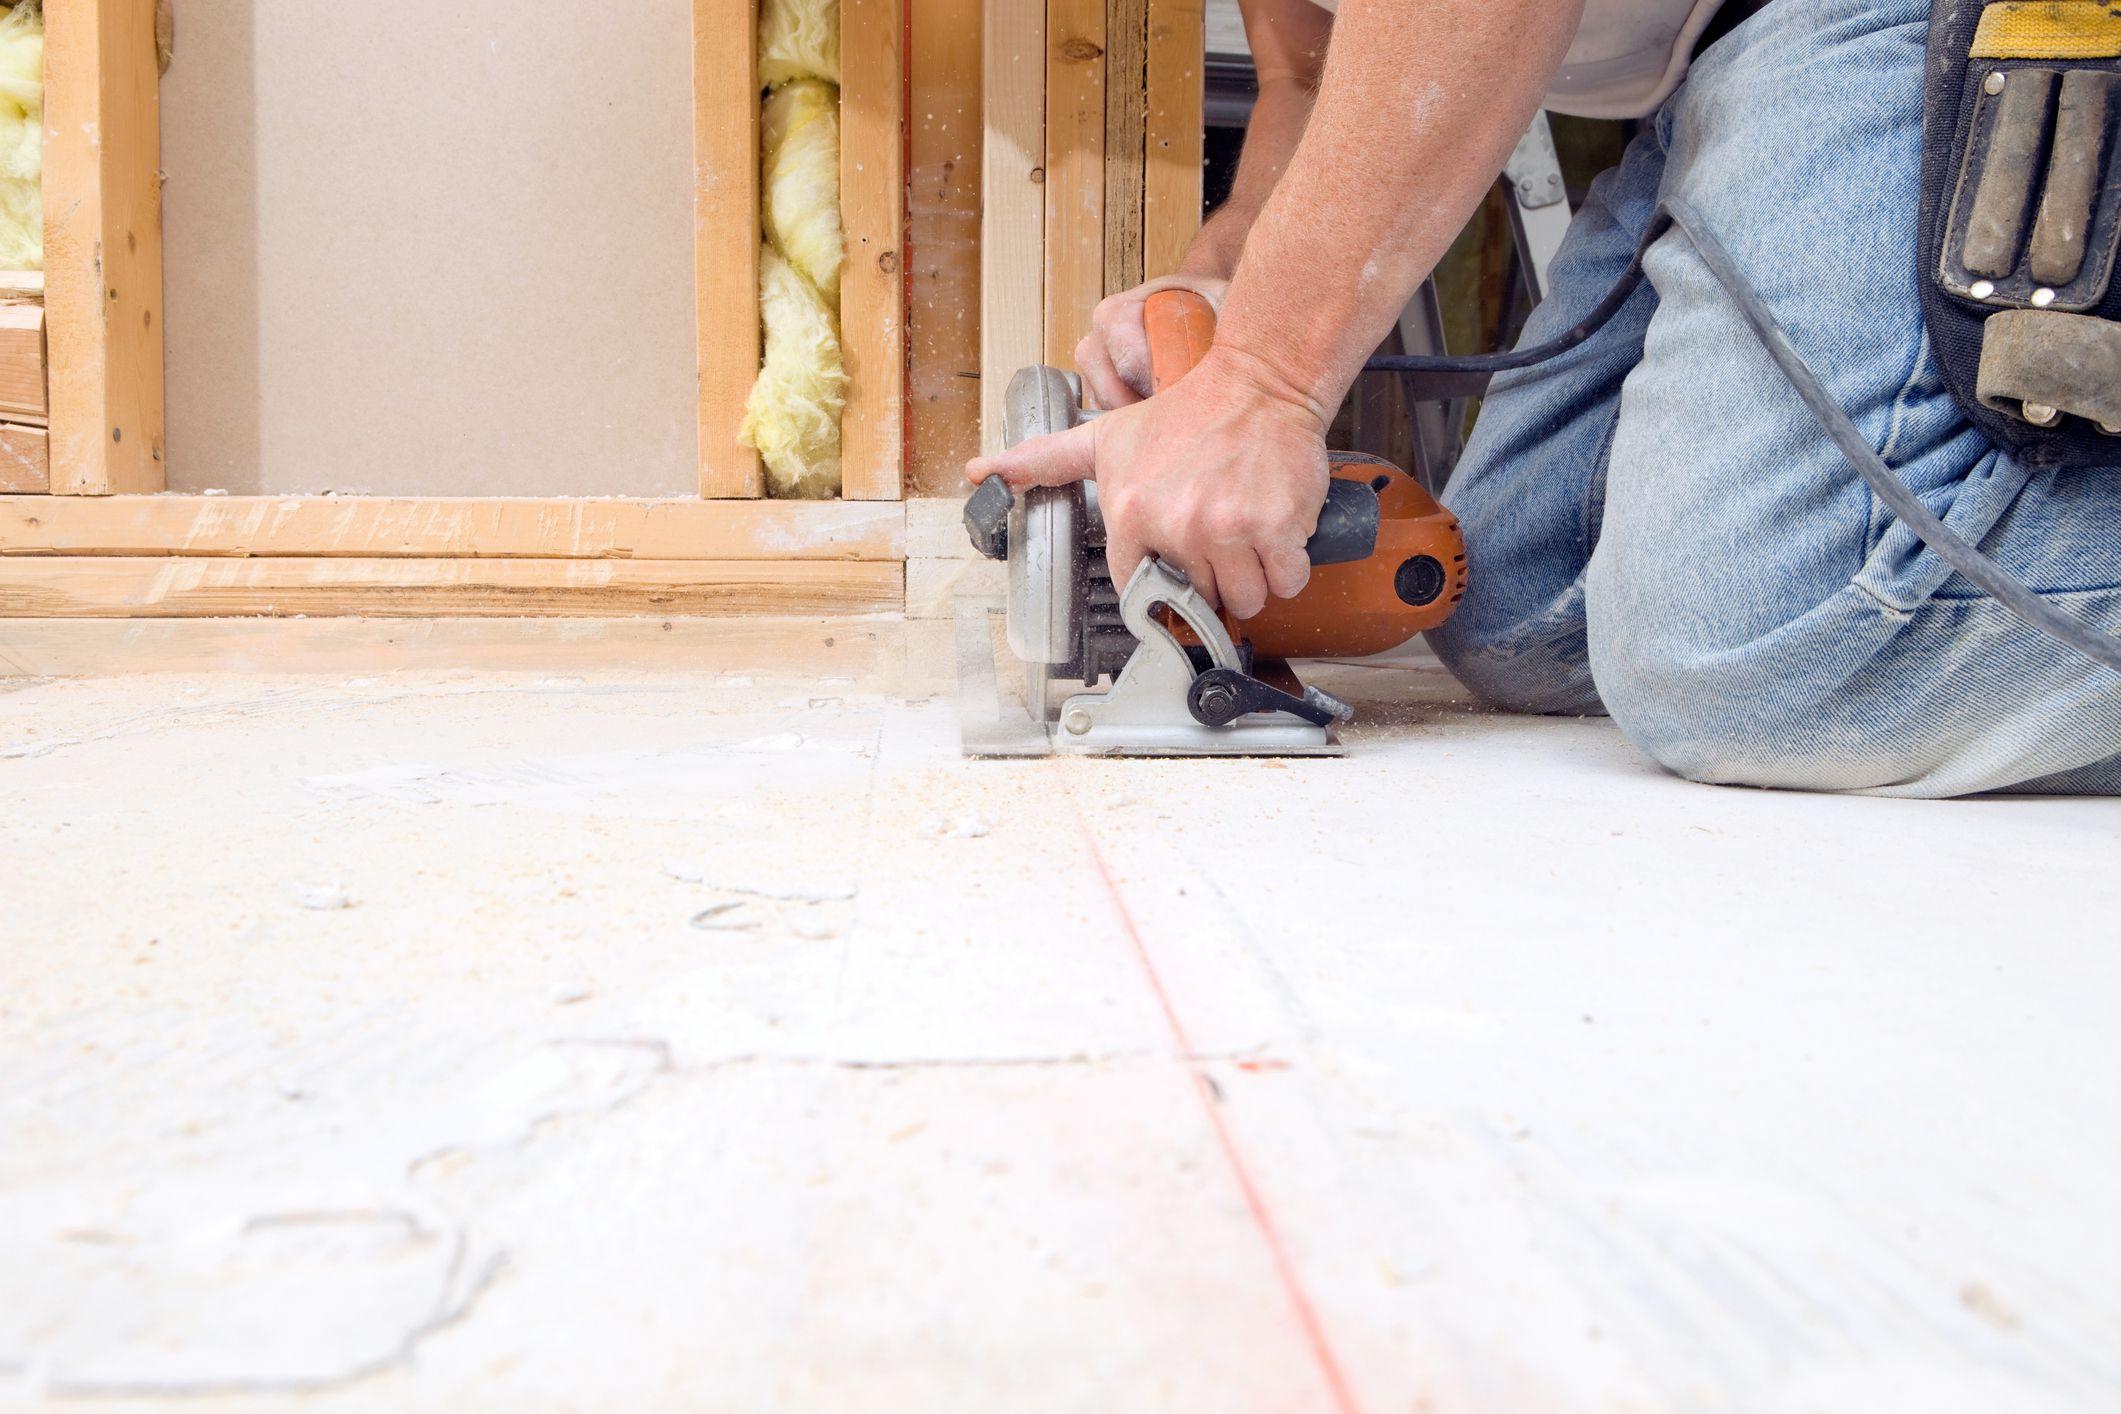 michigan hardwood flooring contractors of do basement subfloor systems work inside basementsubfloor gettyimages 185001220 59d552dbaad52b0010b452cc